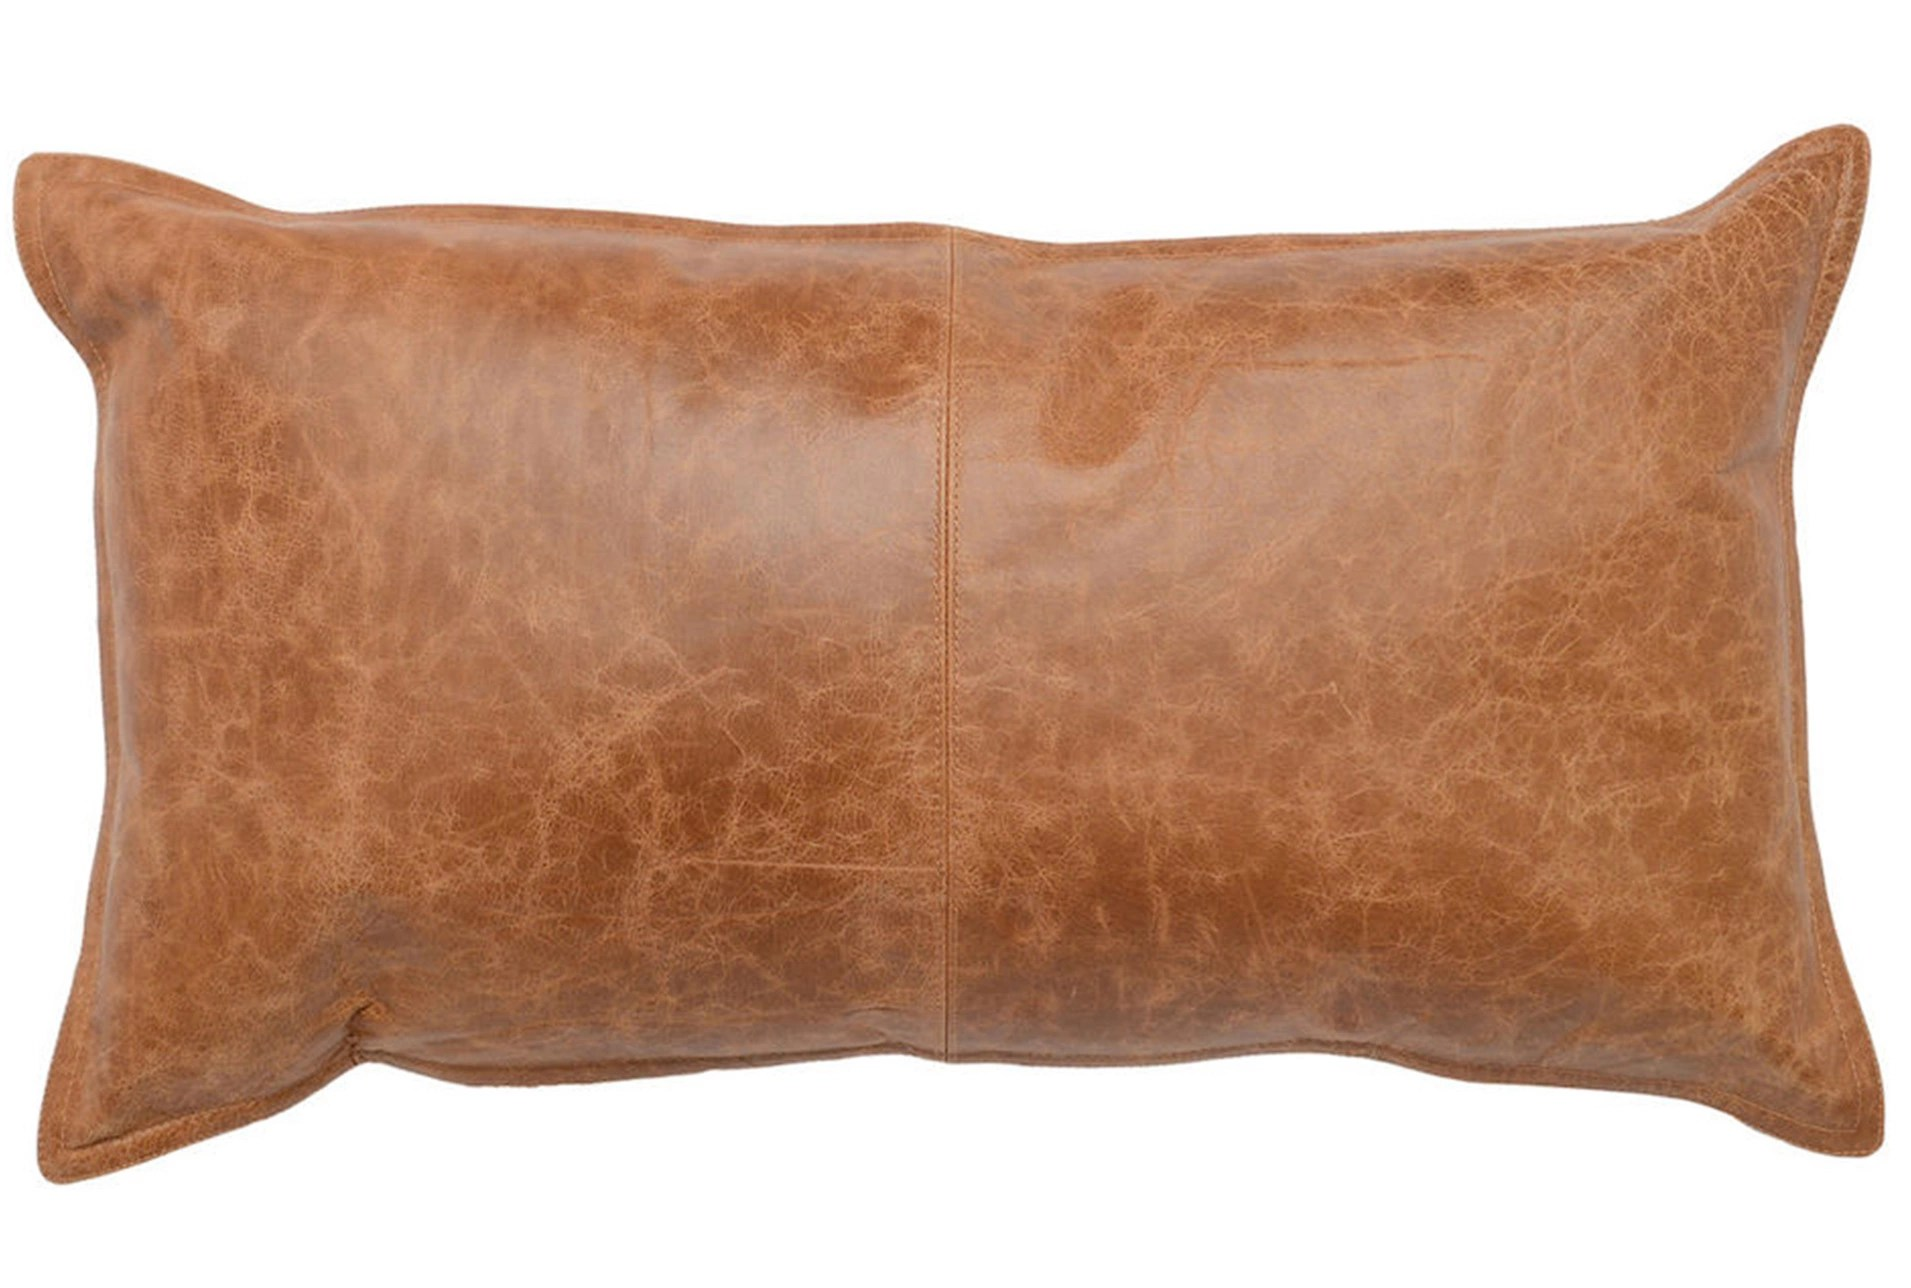 14x26 chestnut brown pieced leather lumbar throw pillow